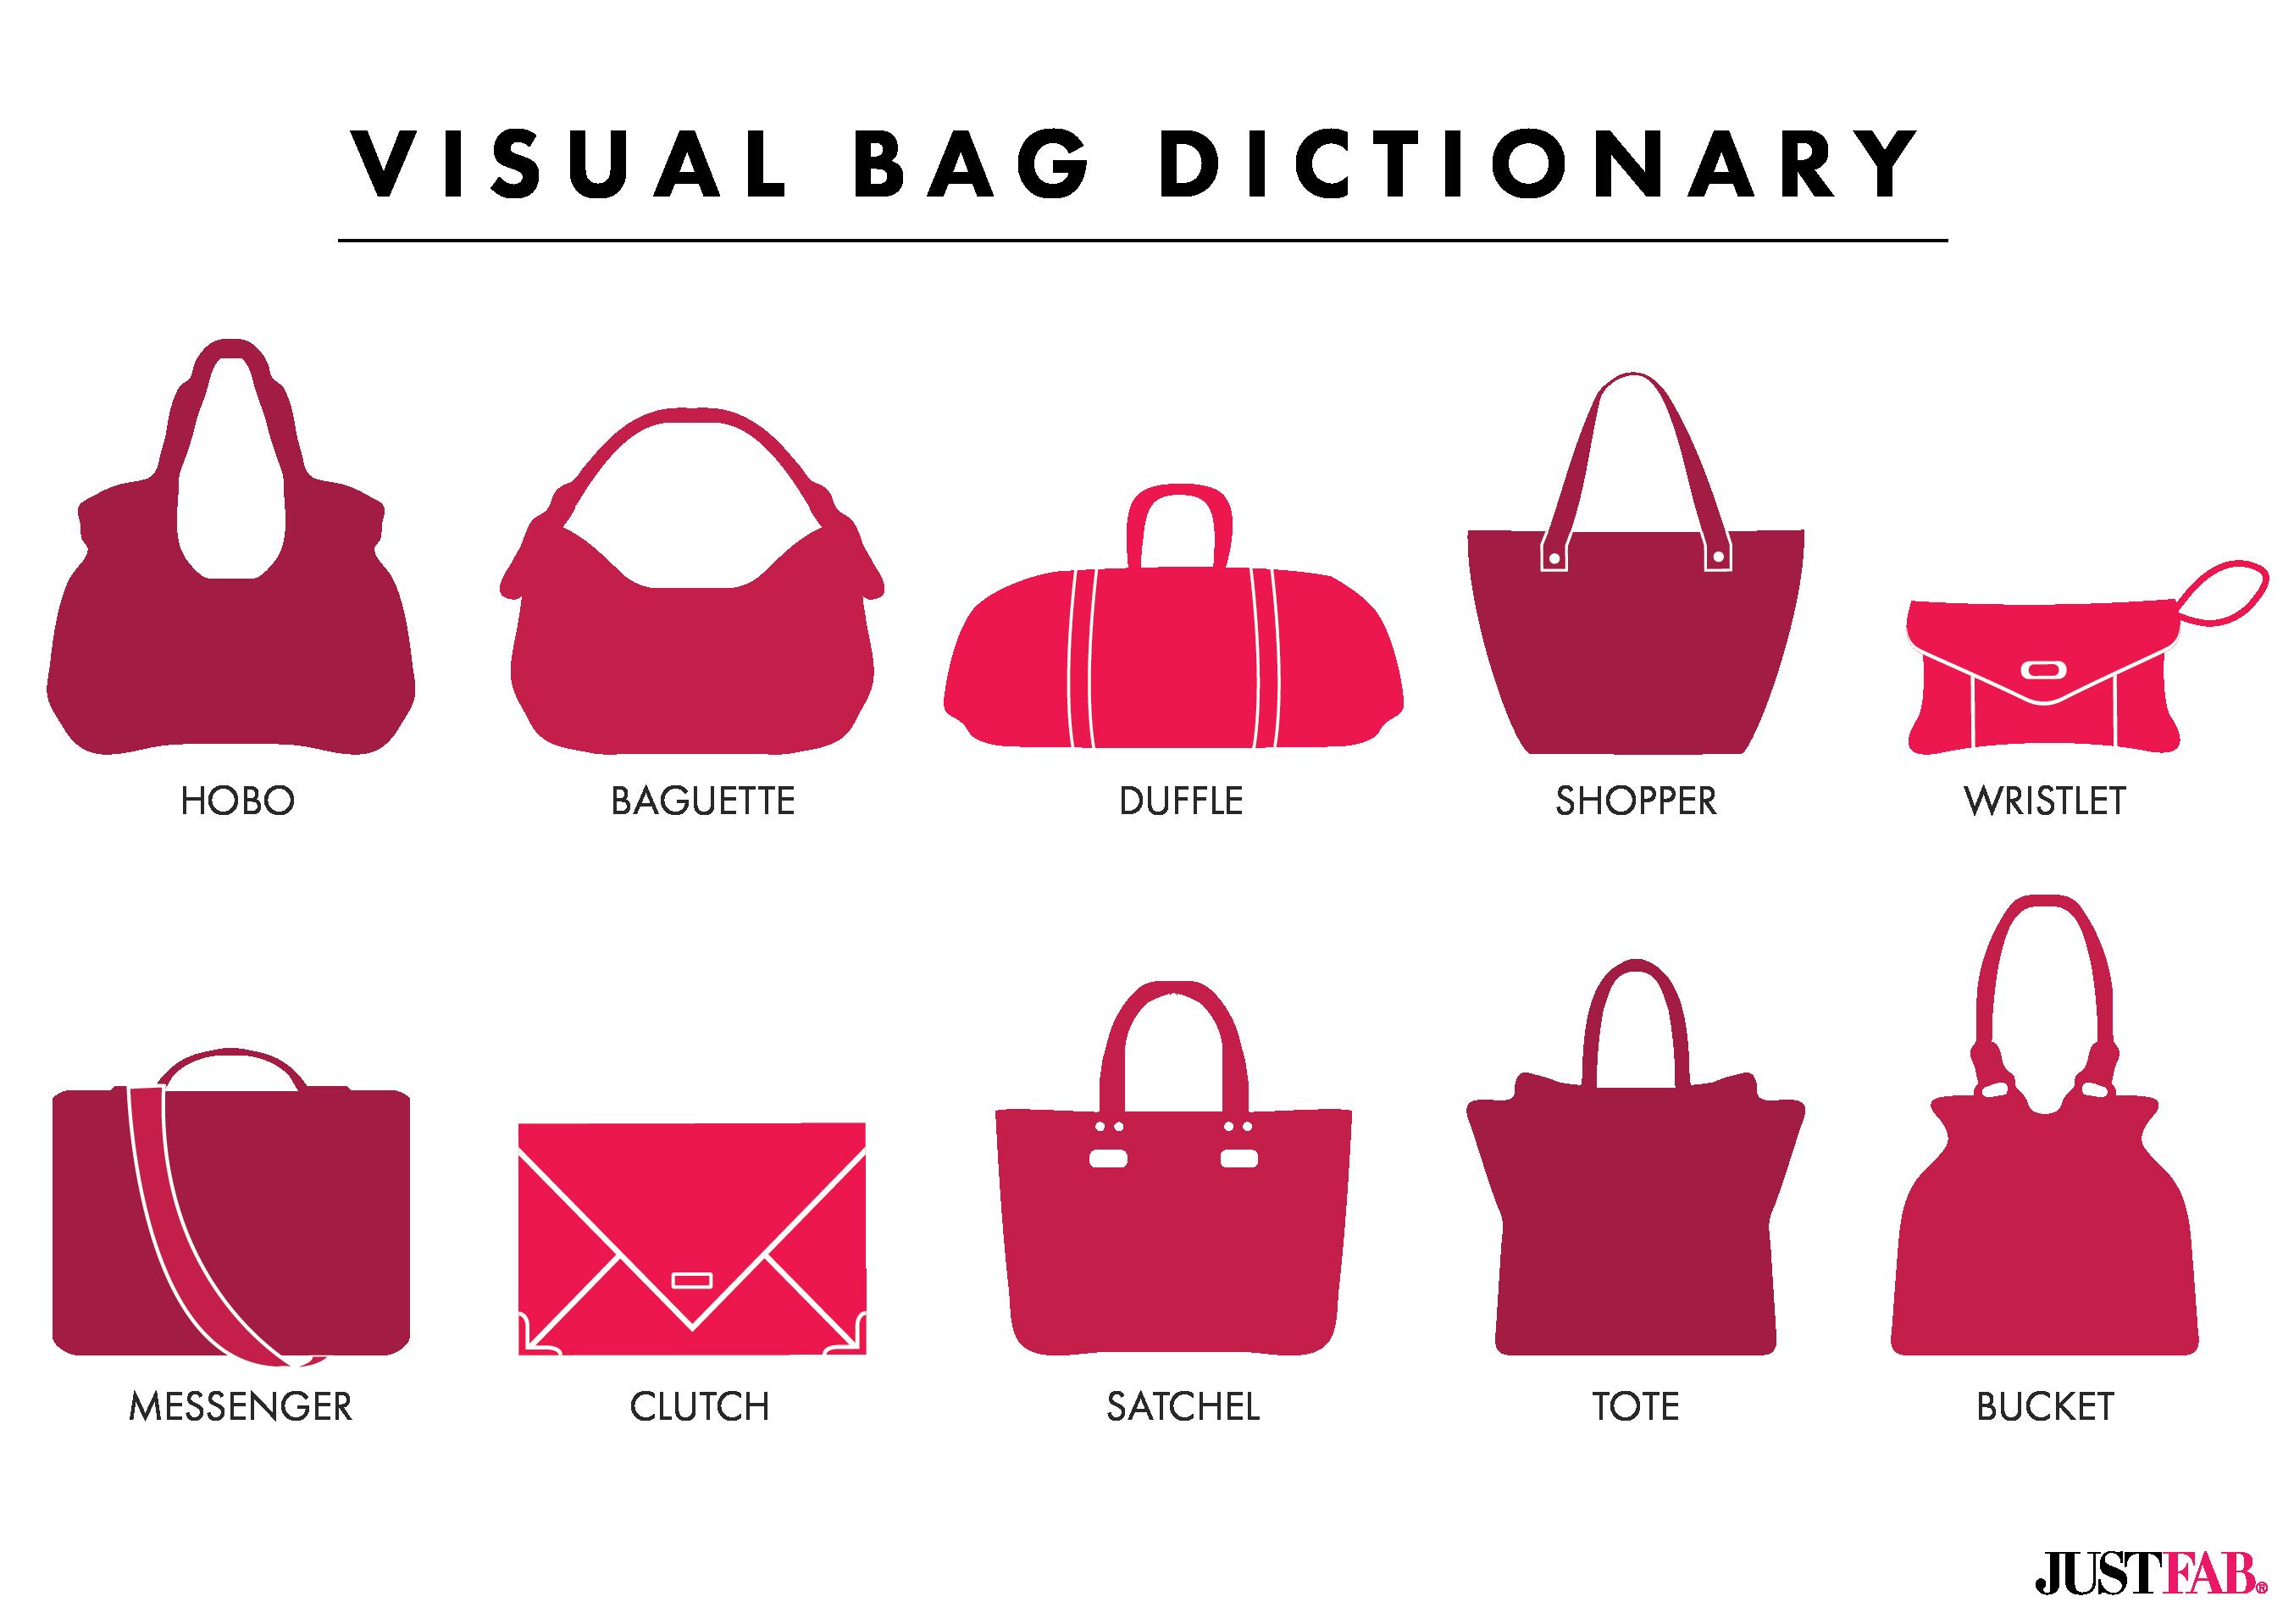 Clipart definition terminology. A visual handbag glossary